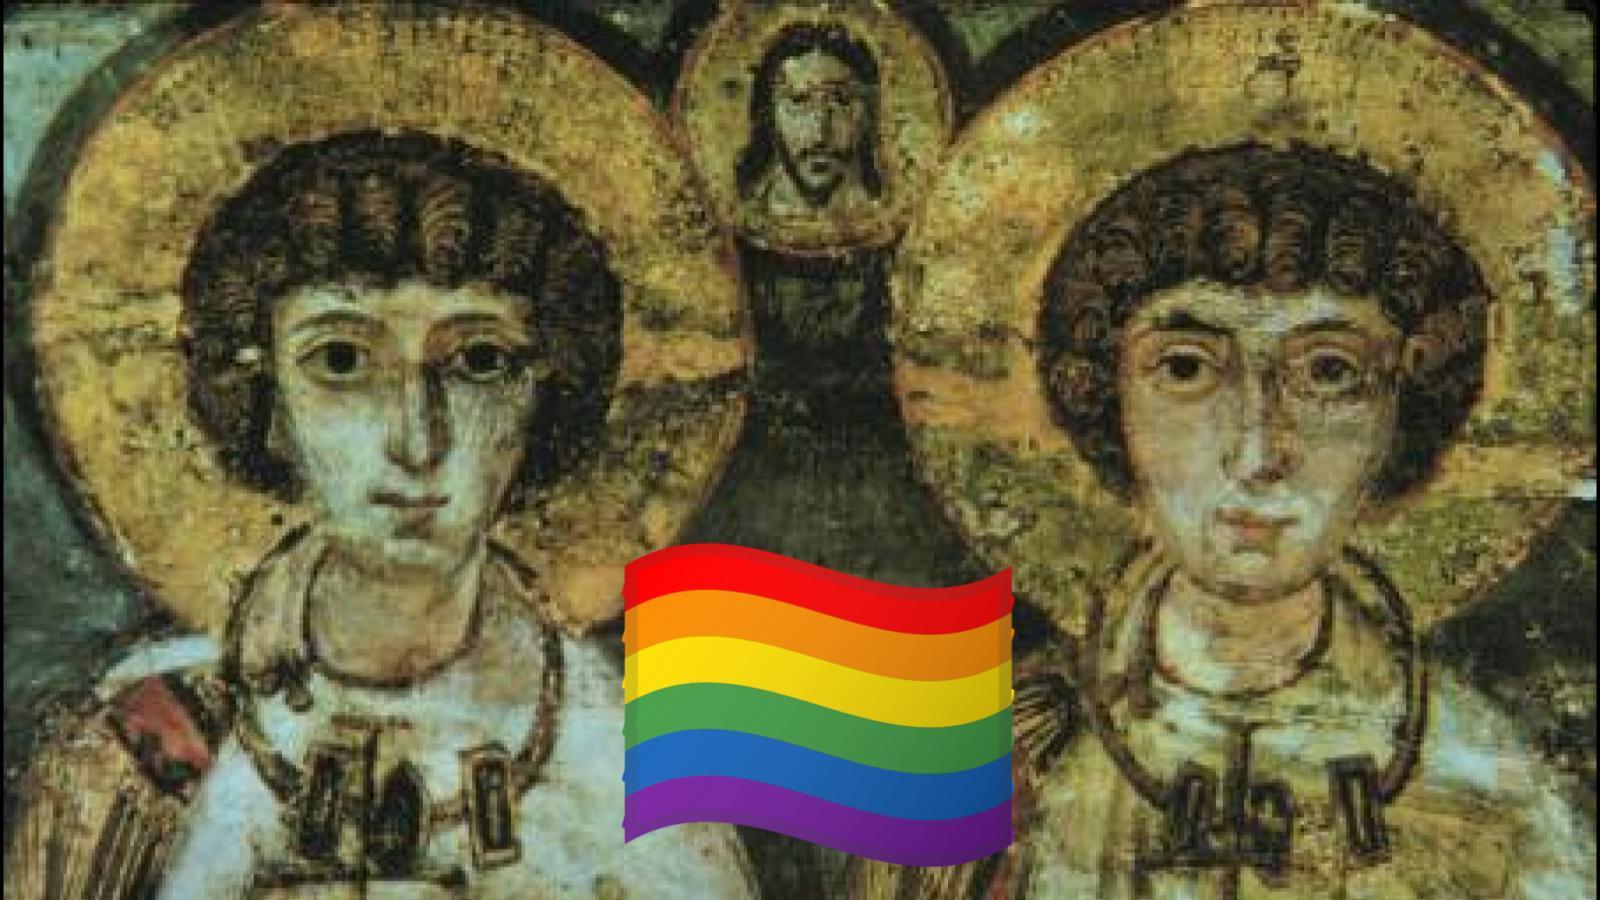 Matrimonio homosexual era avalado por la Iglesia en la Edad Media